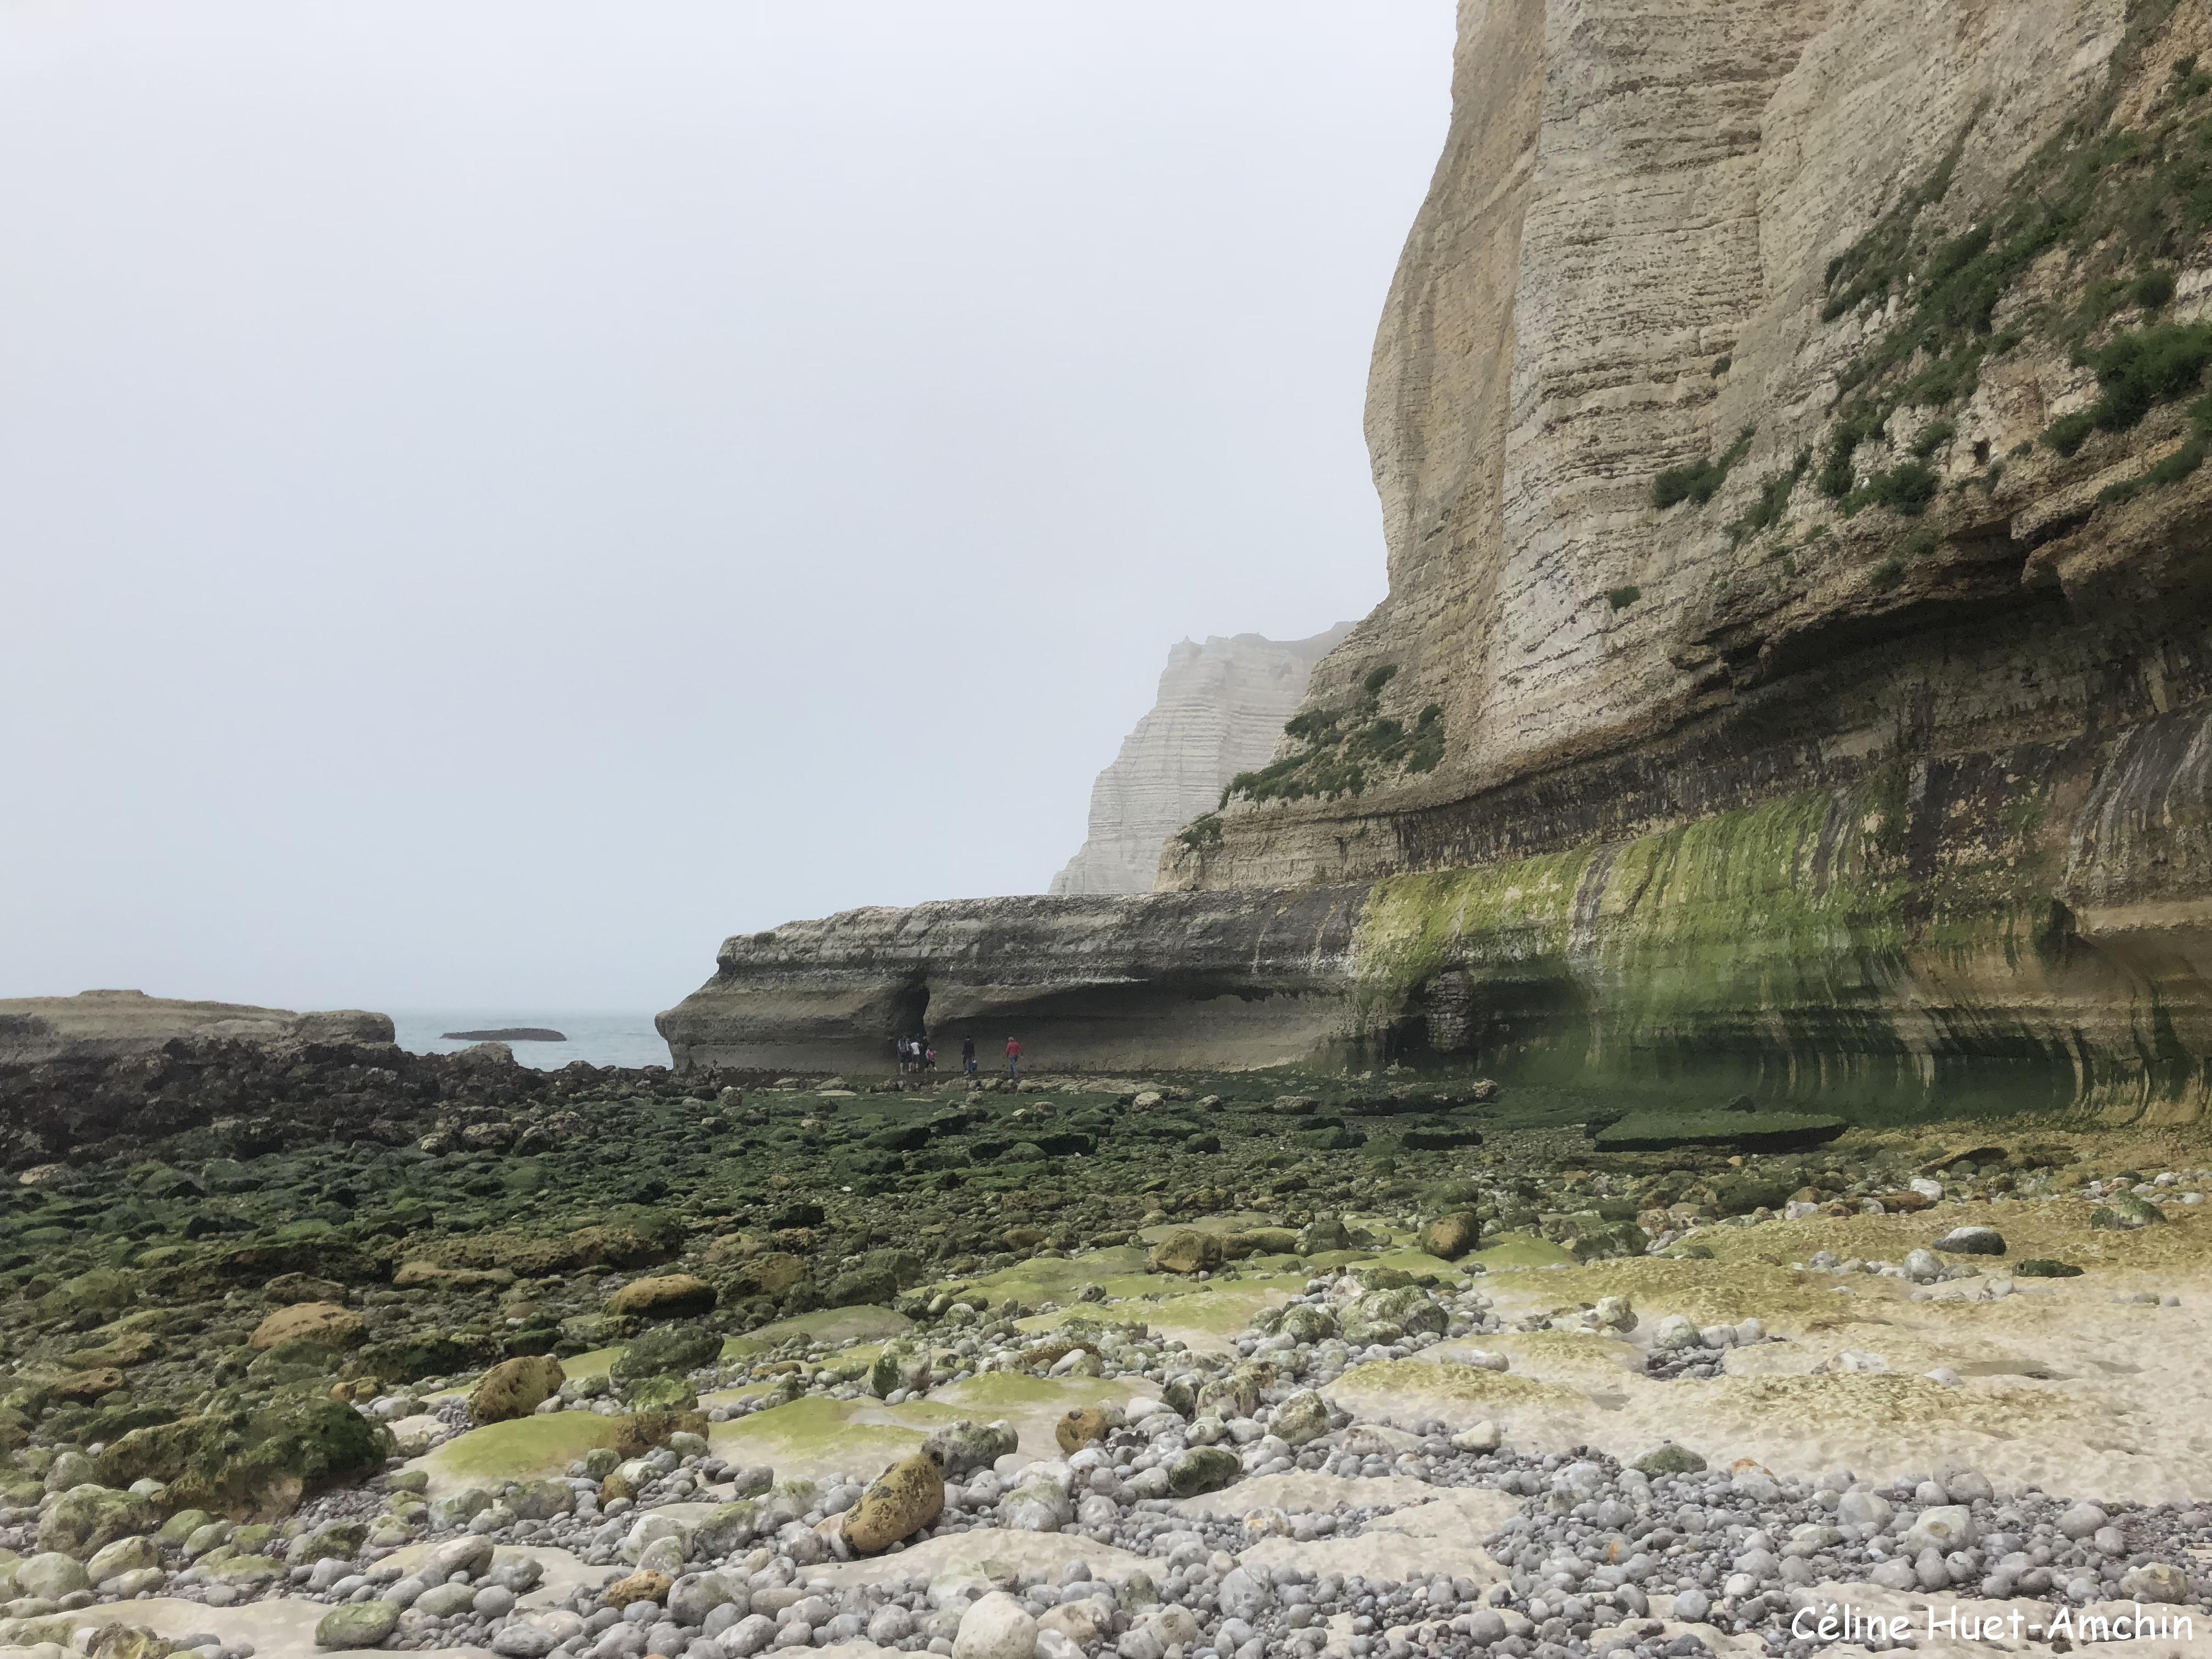 La Valleuse de Valaine Etretat Normandie